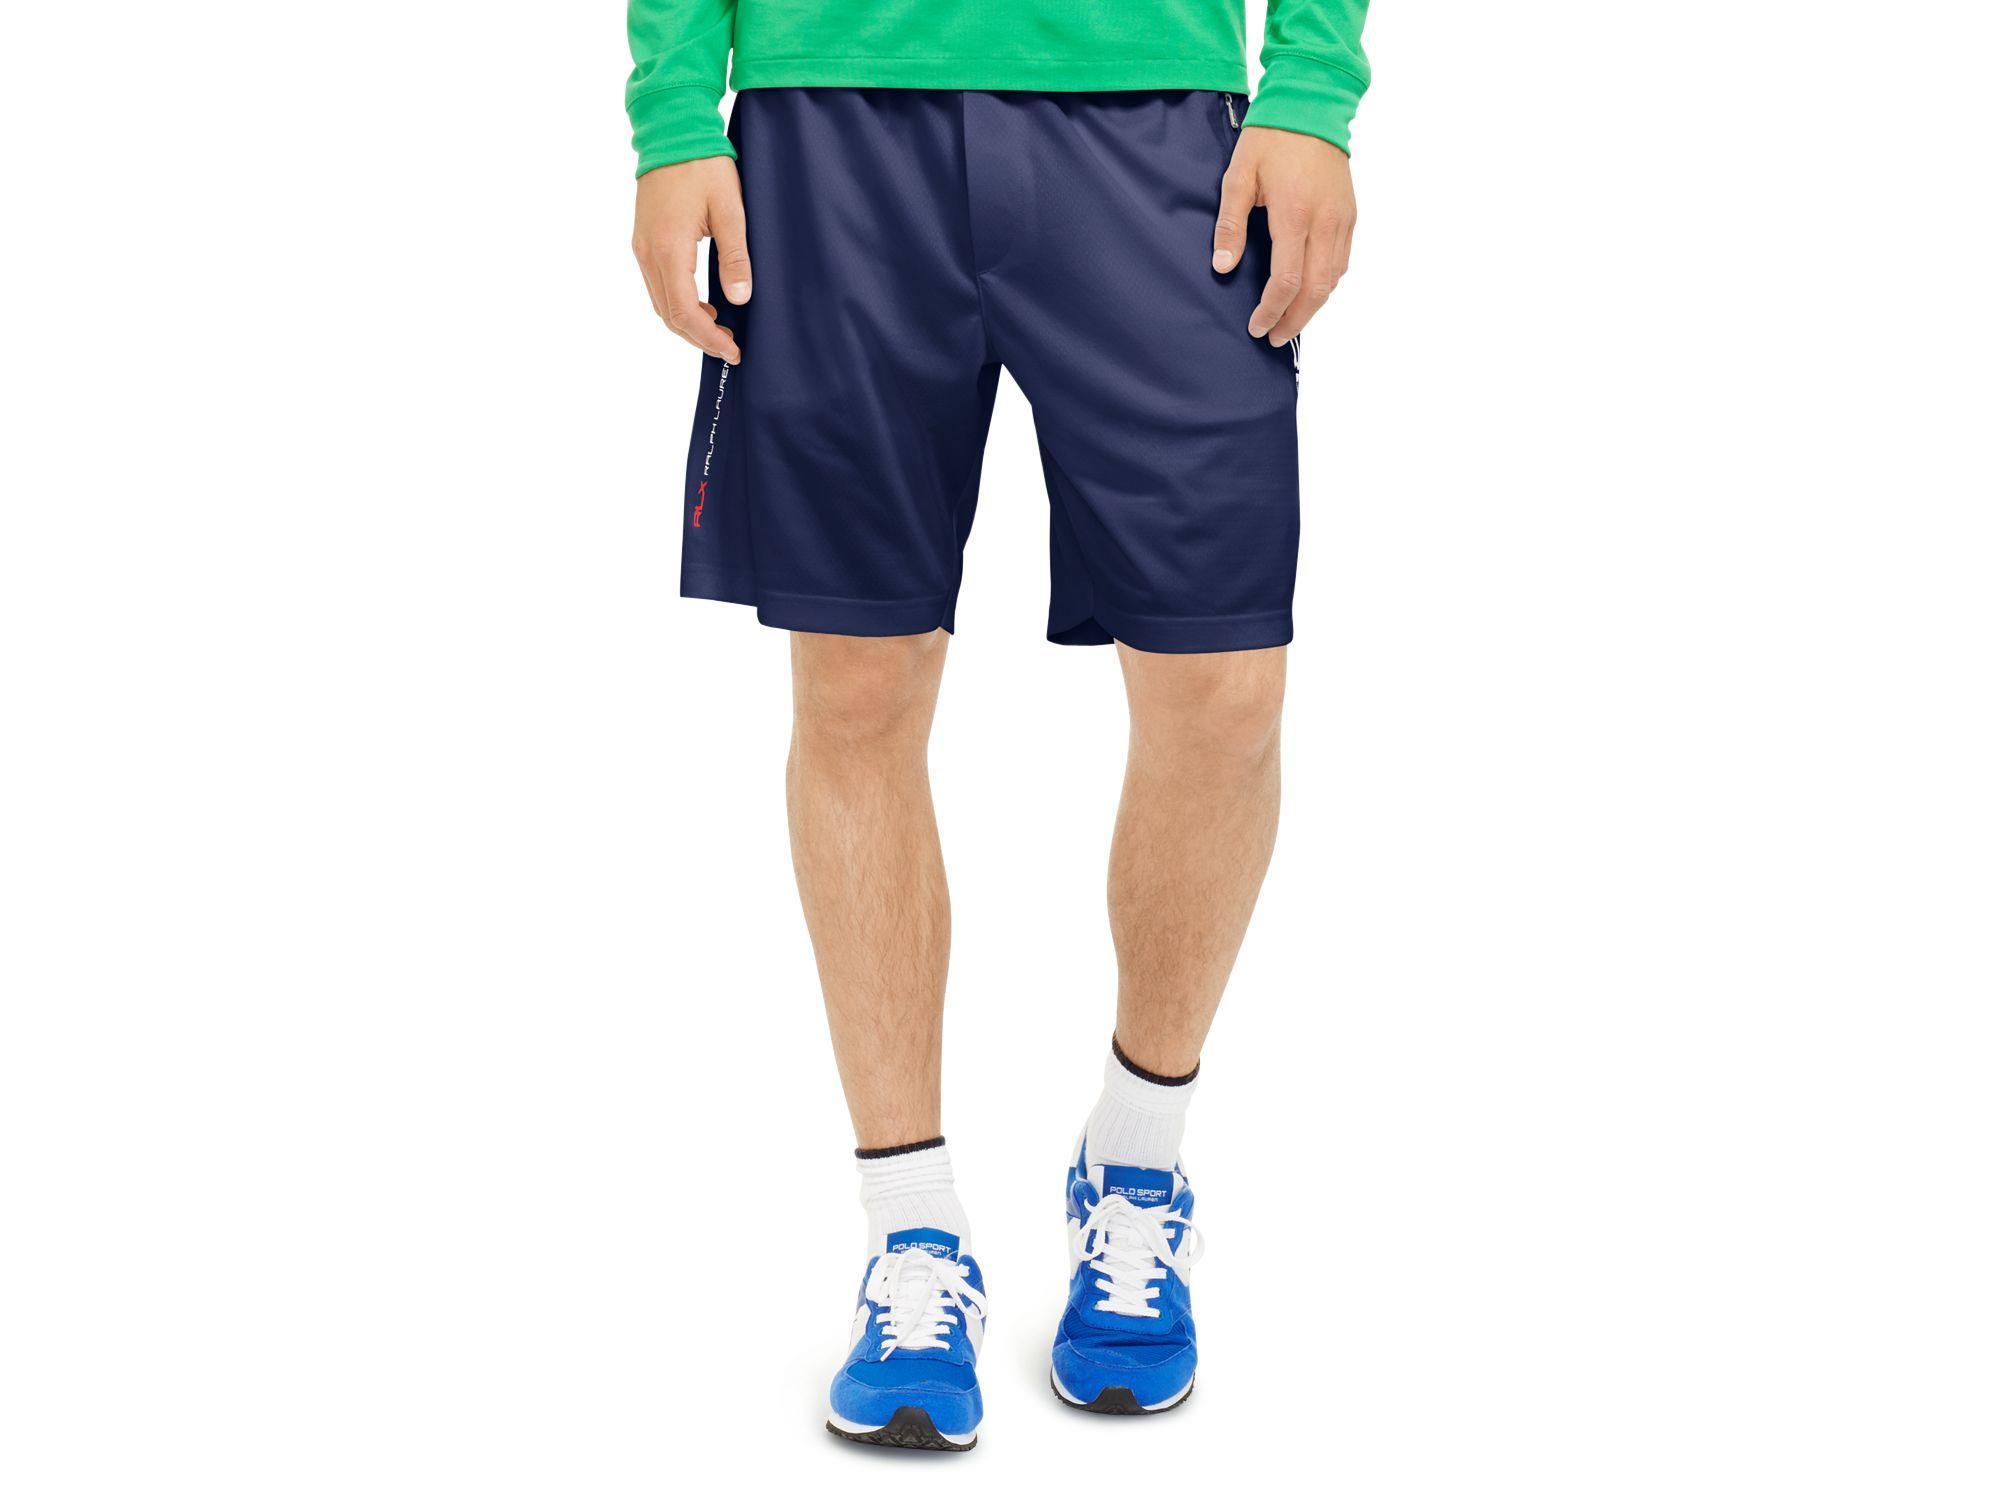 3c36f40aa ... shorts nwt 8e806 8c64e  sale lyst ralph lauren polo sport rlx  engineered mesh compression 35d72 c4fbc